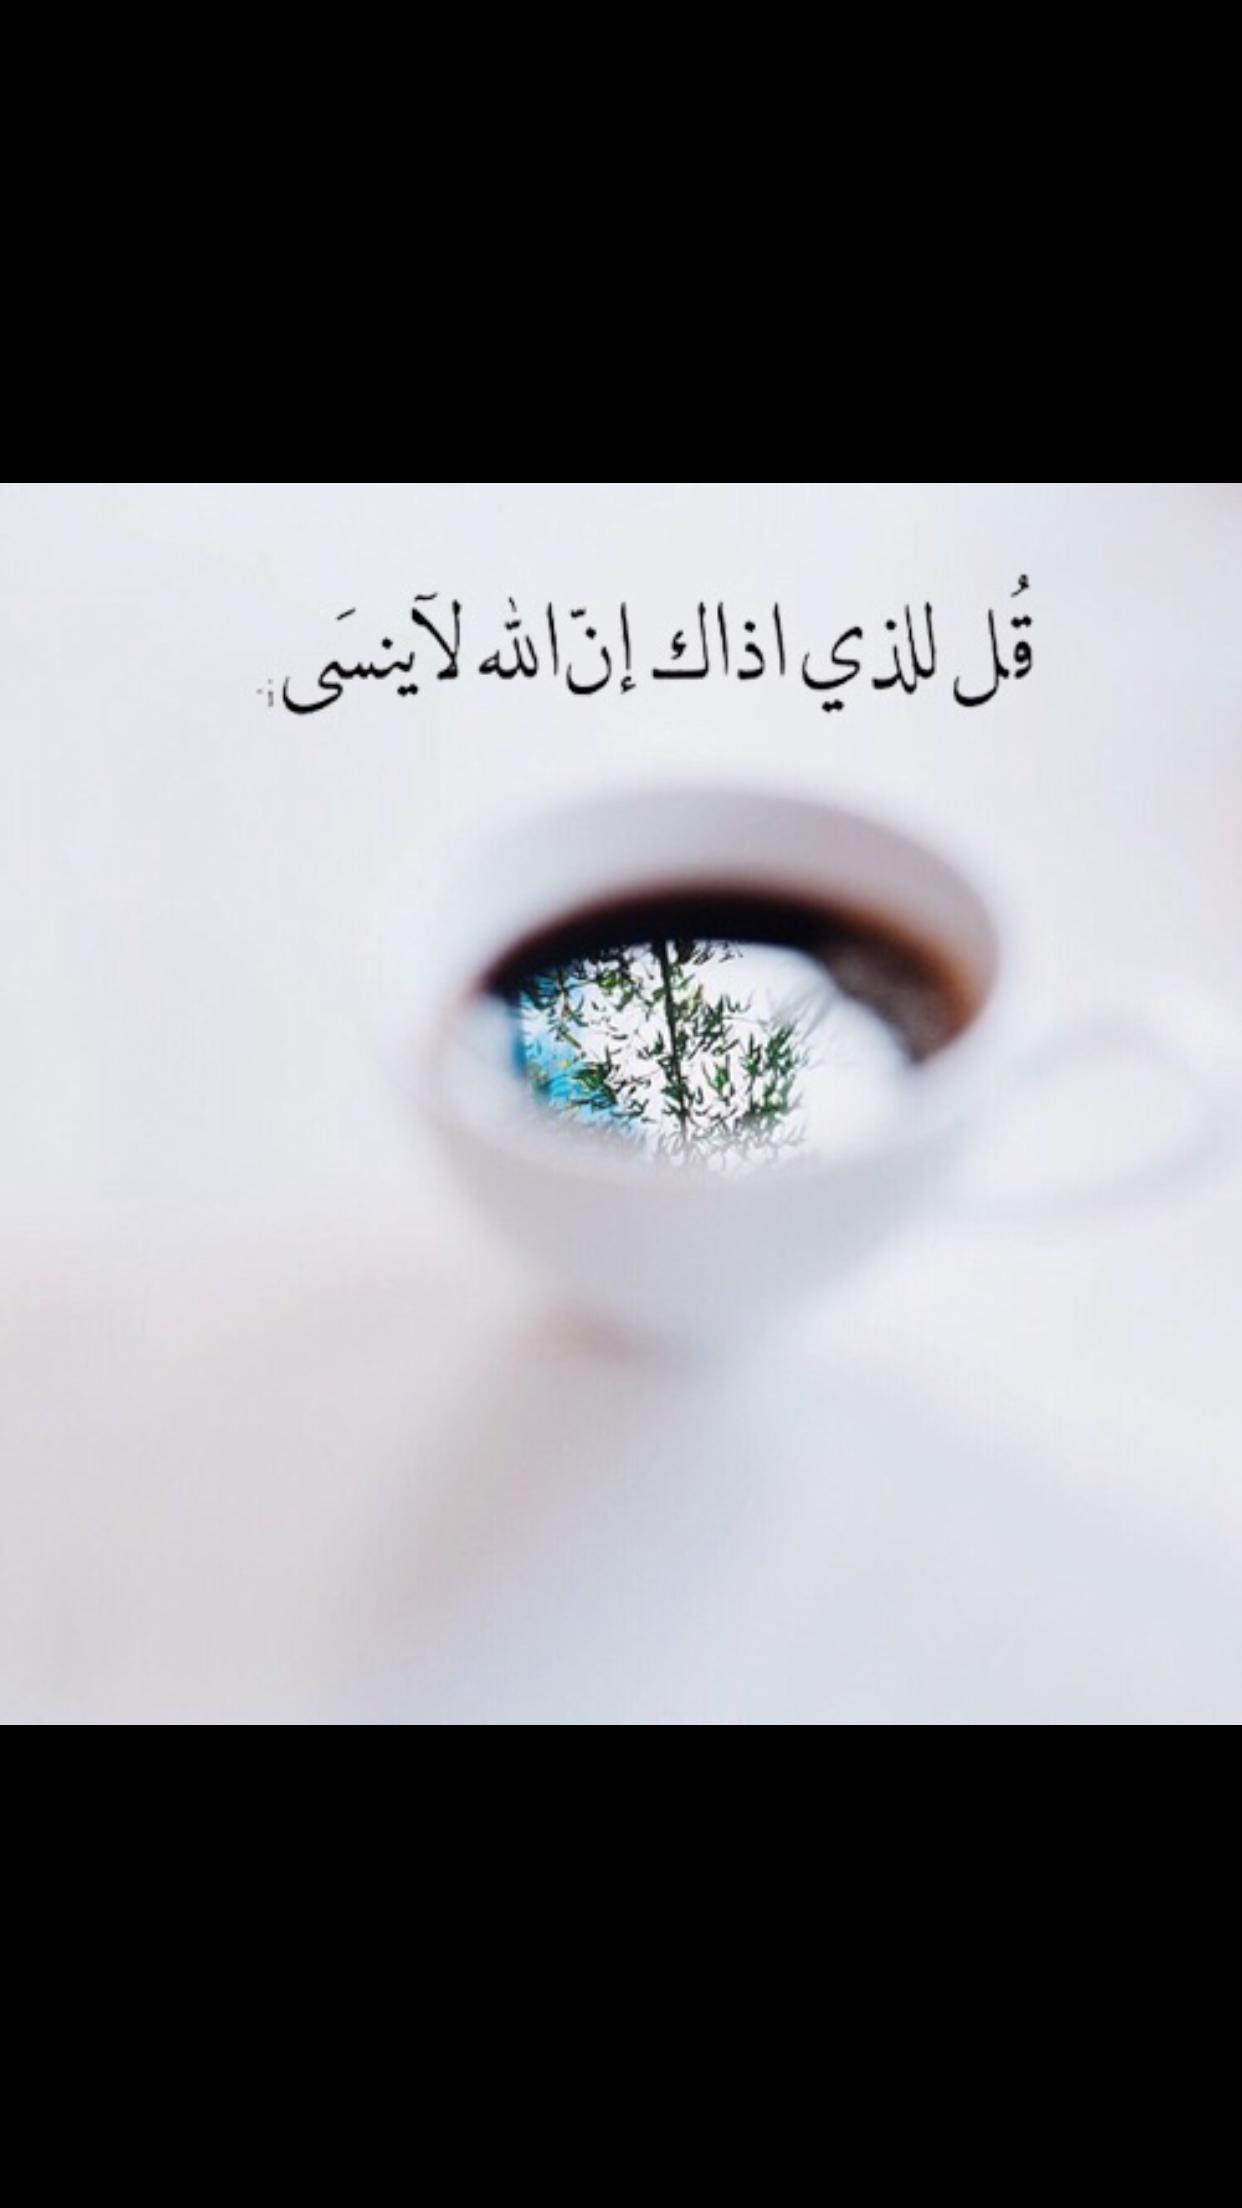 ان الله لا ينسى Islamic Quotes Wallpaper Narcissism Quotes Arabic Phrases